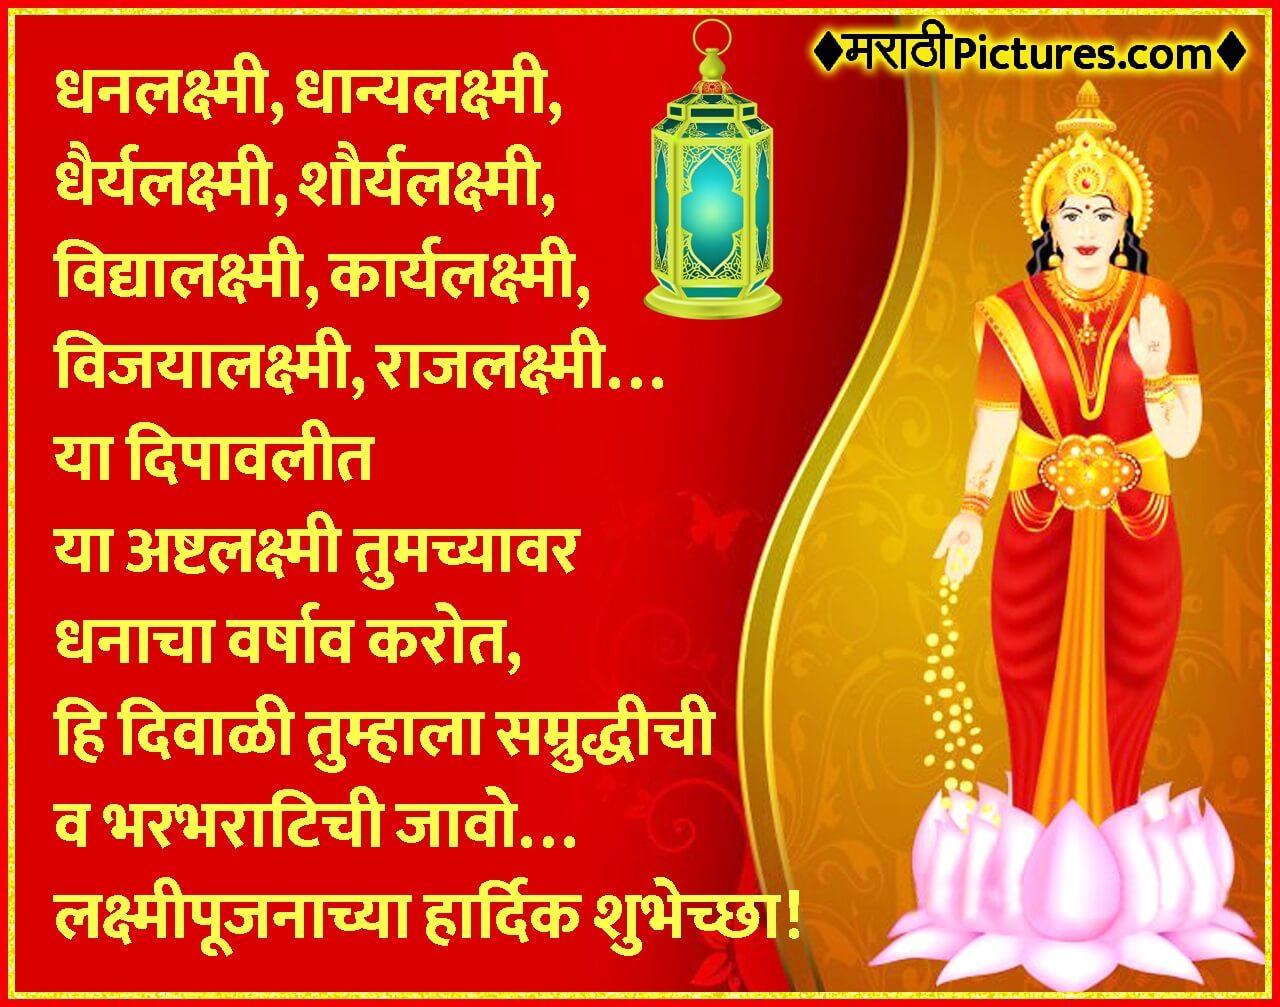 Laxmi Poojan Chya Hardik Shubhechha - Marathi Pictures ... Vadhdivas Chya Hardik Shubhechha